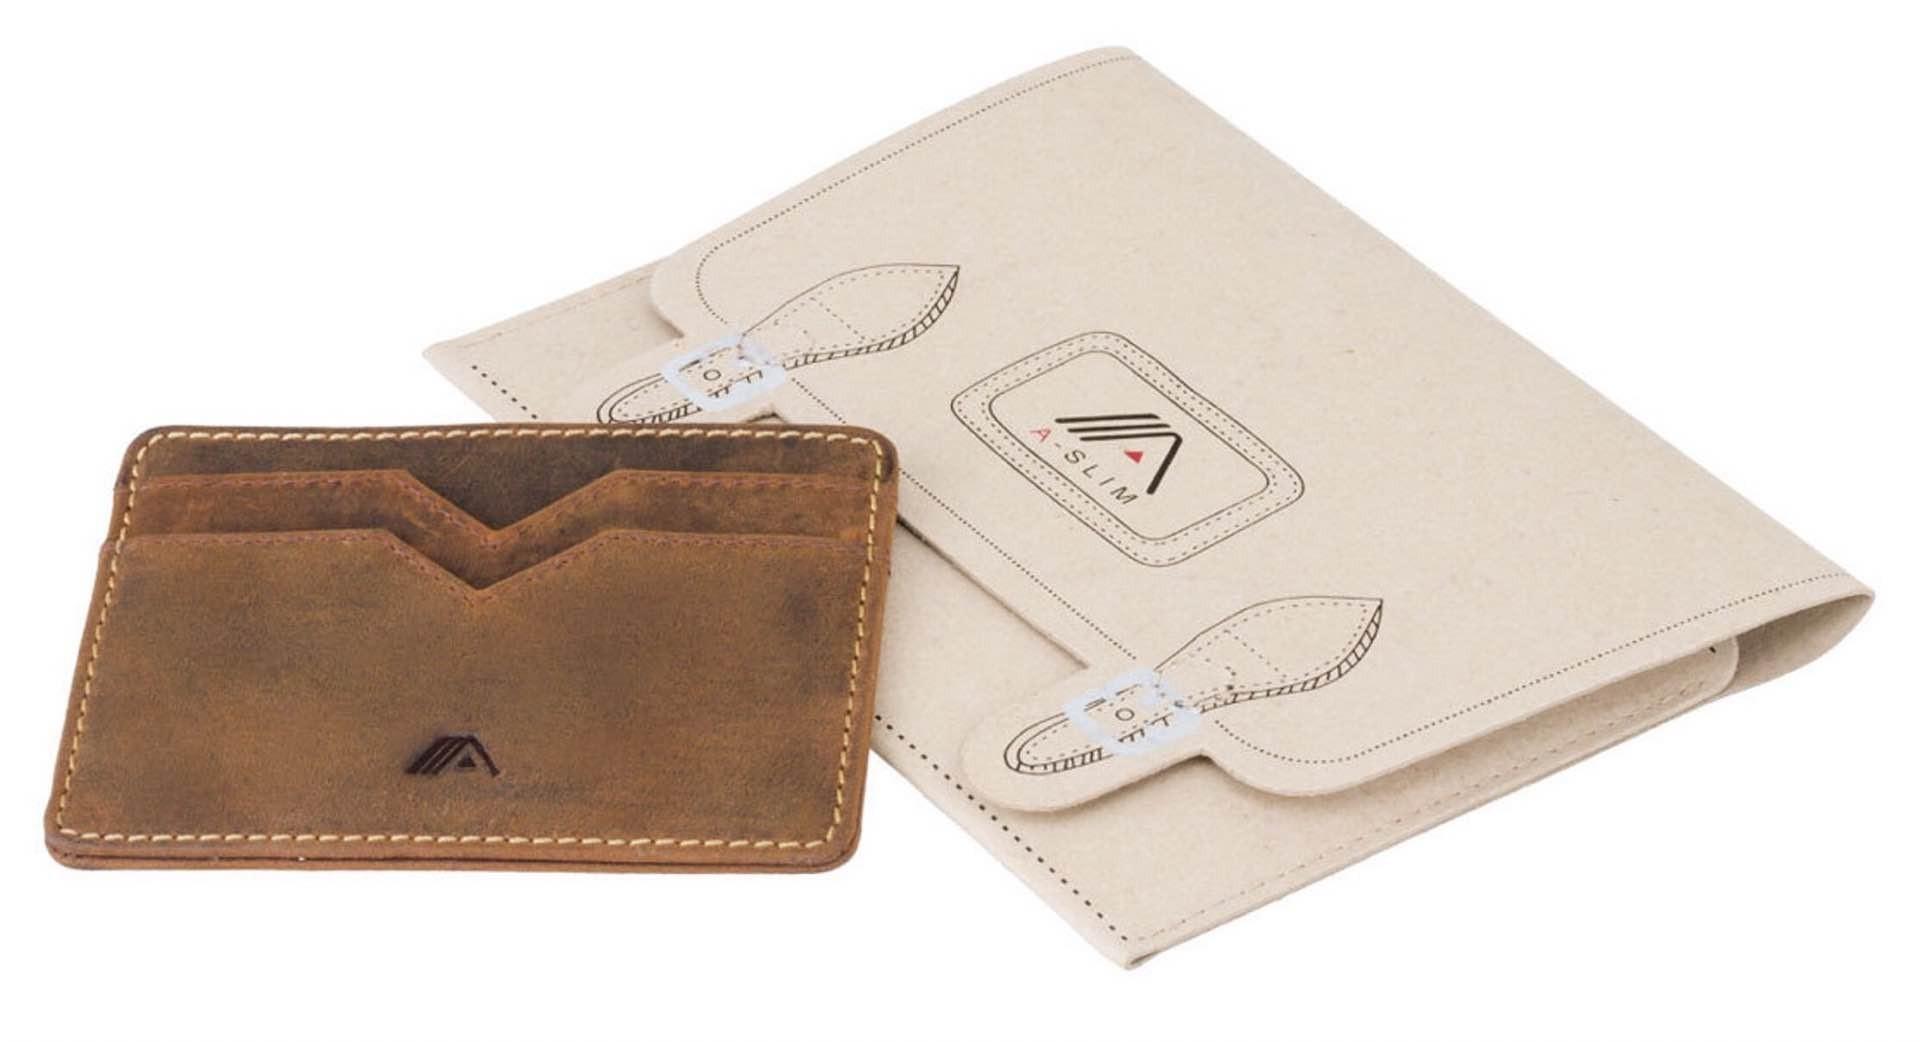 a-slim-yaiba-slim-leather-card-holder-packaging